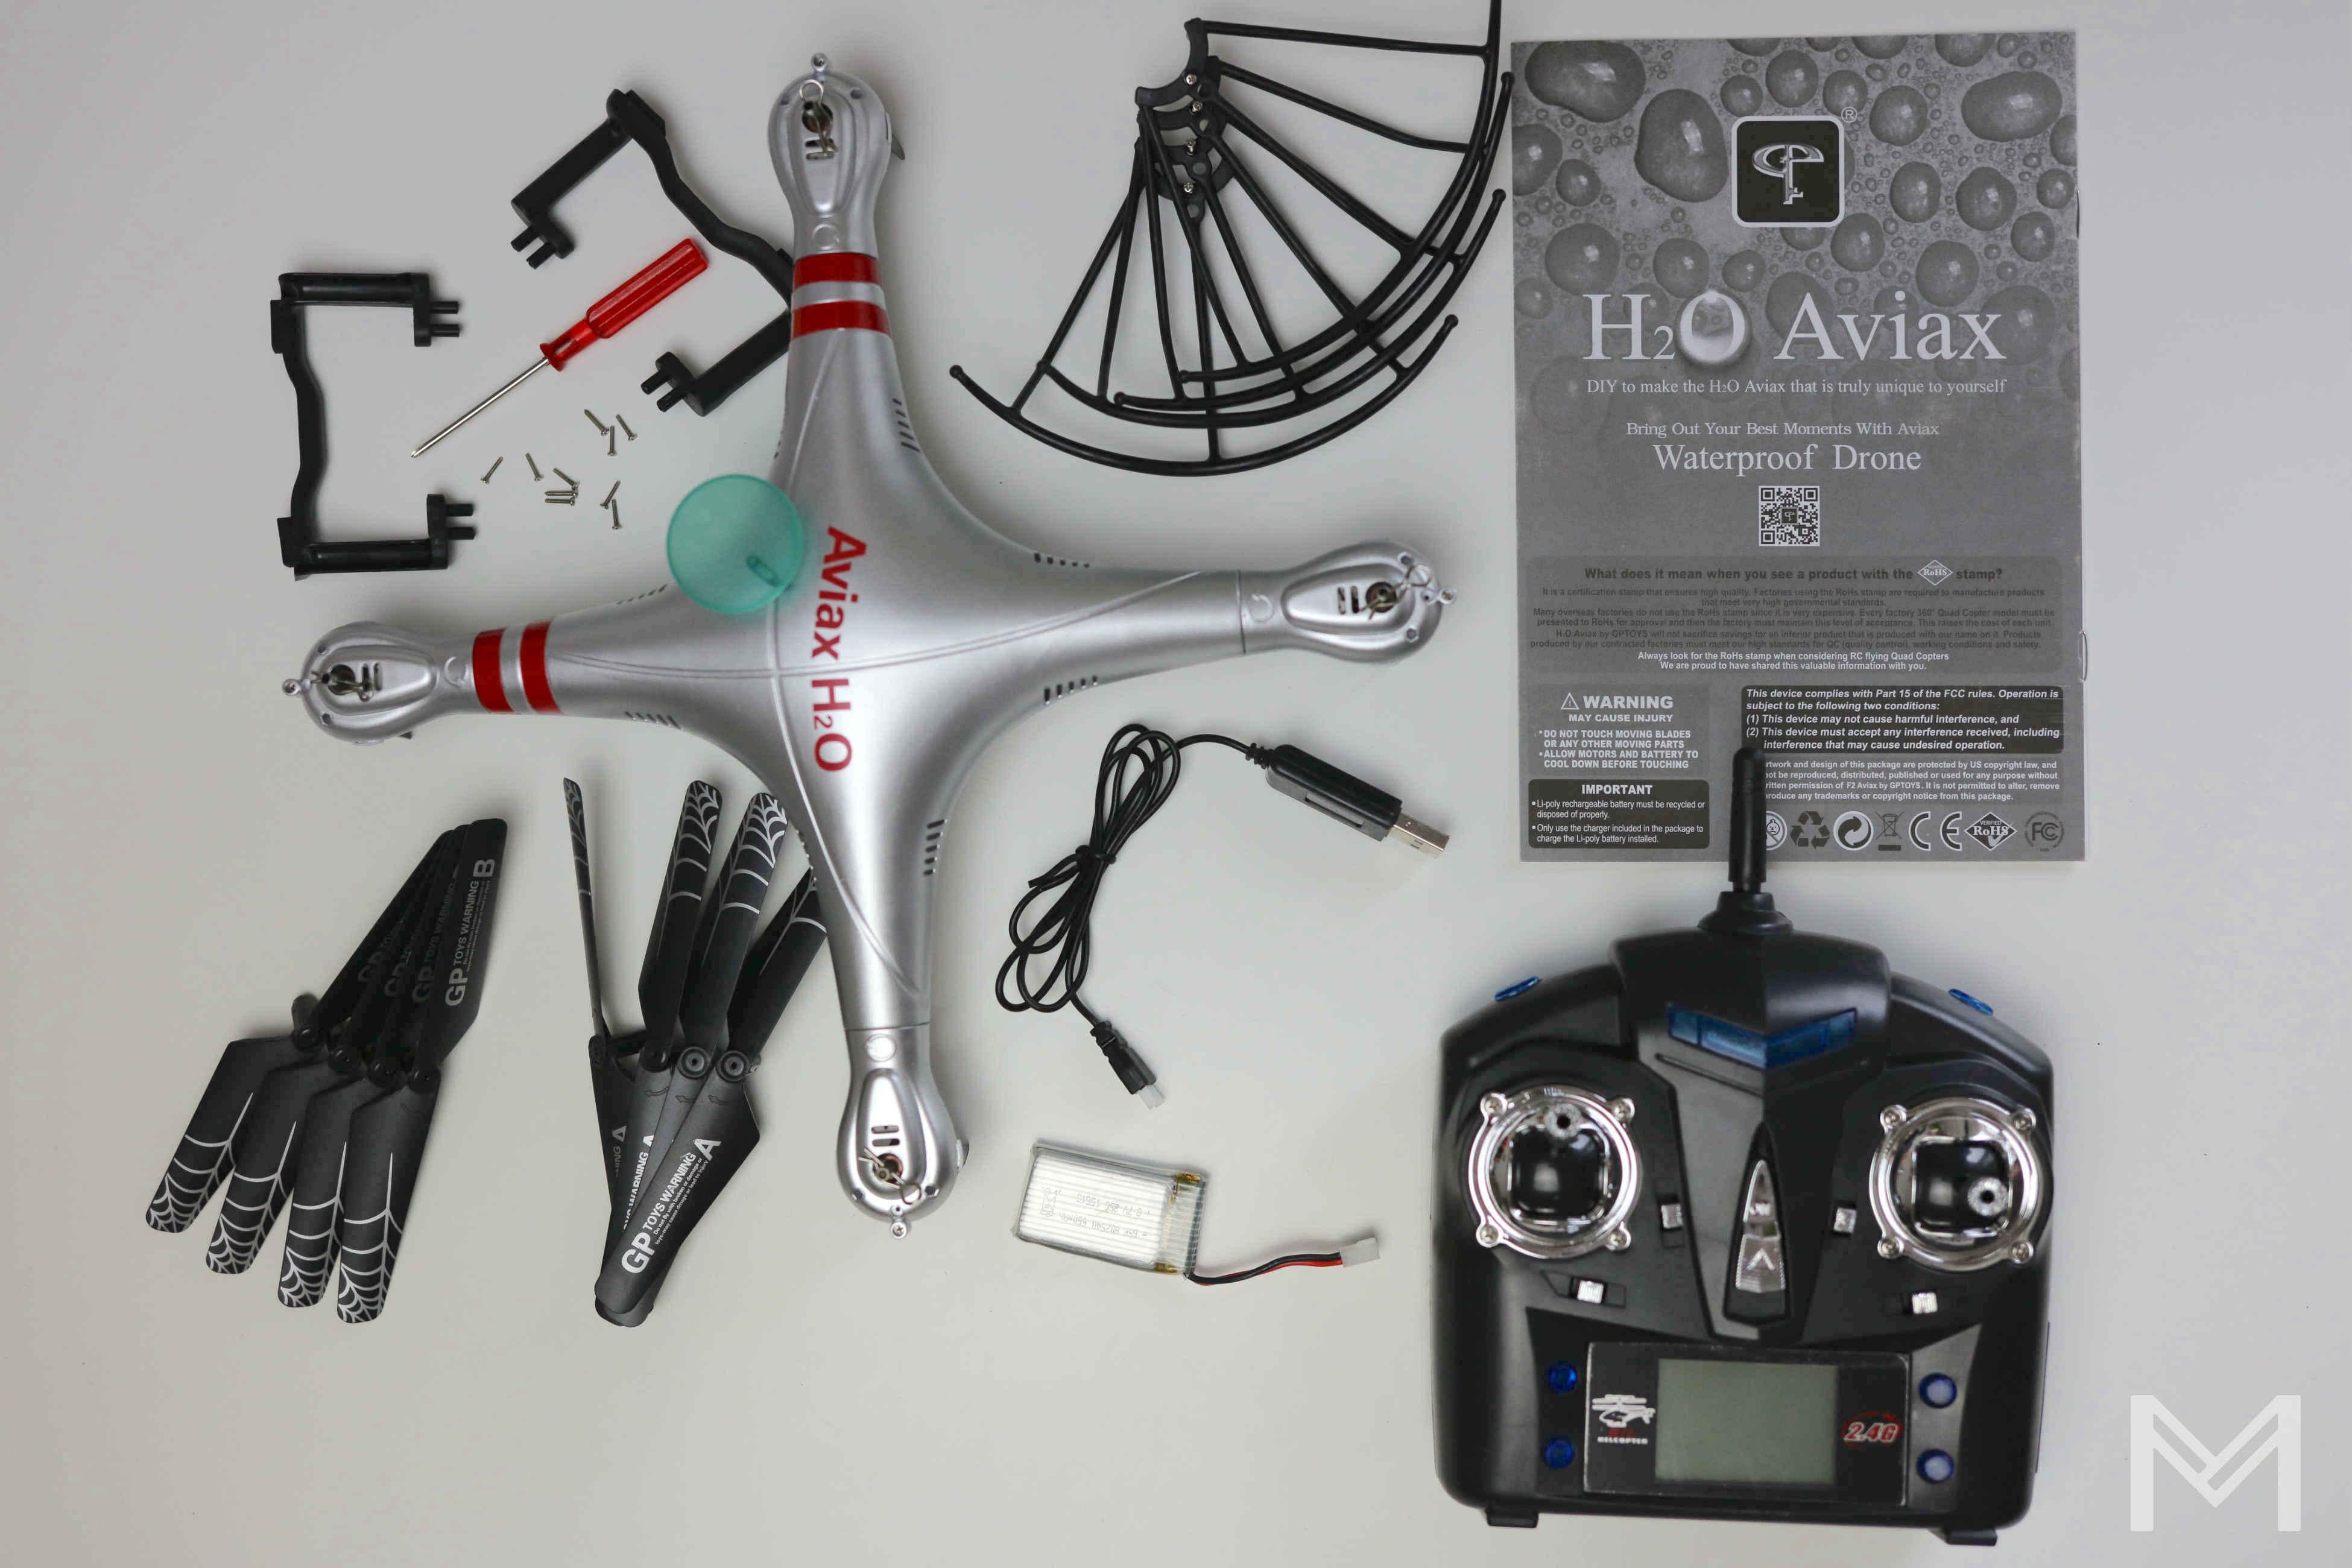 gptoys h2o aviax lieferumfang metropolitanmonkey.com